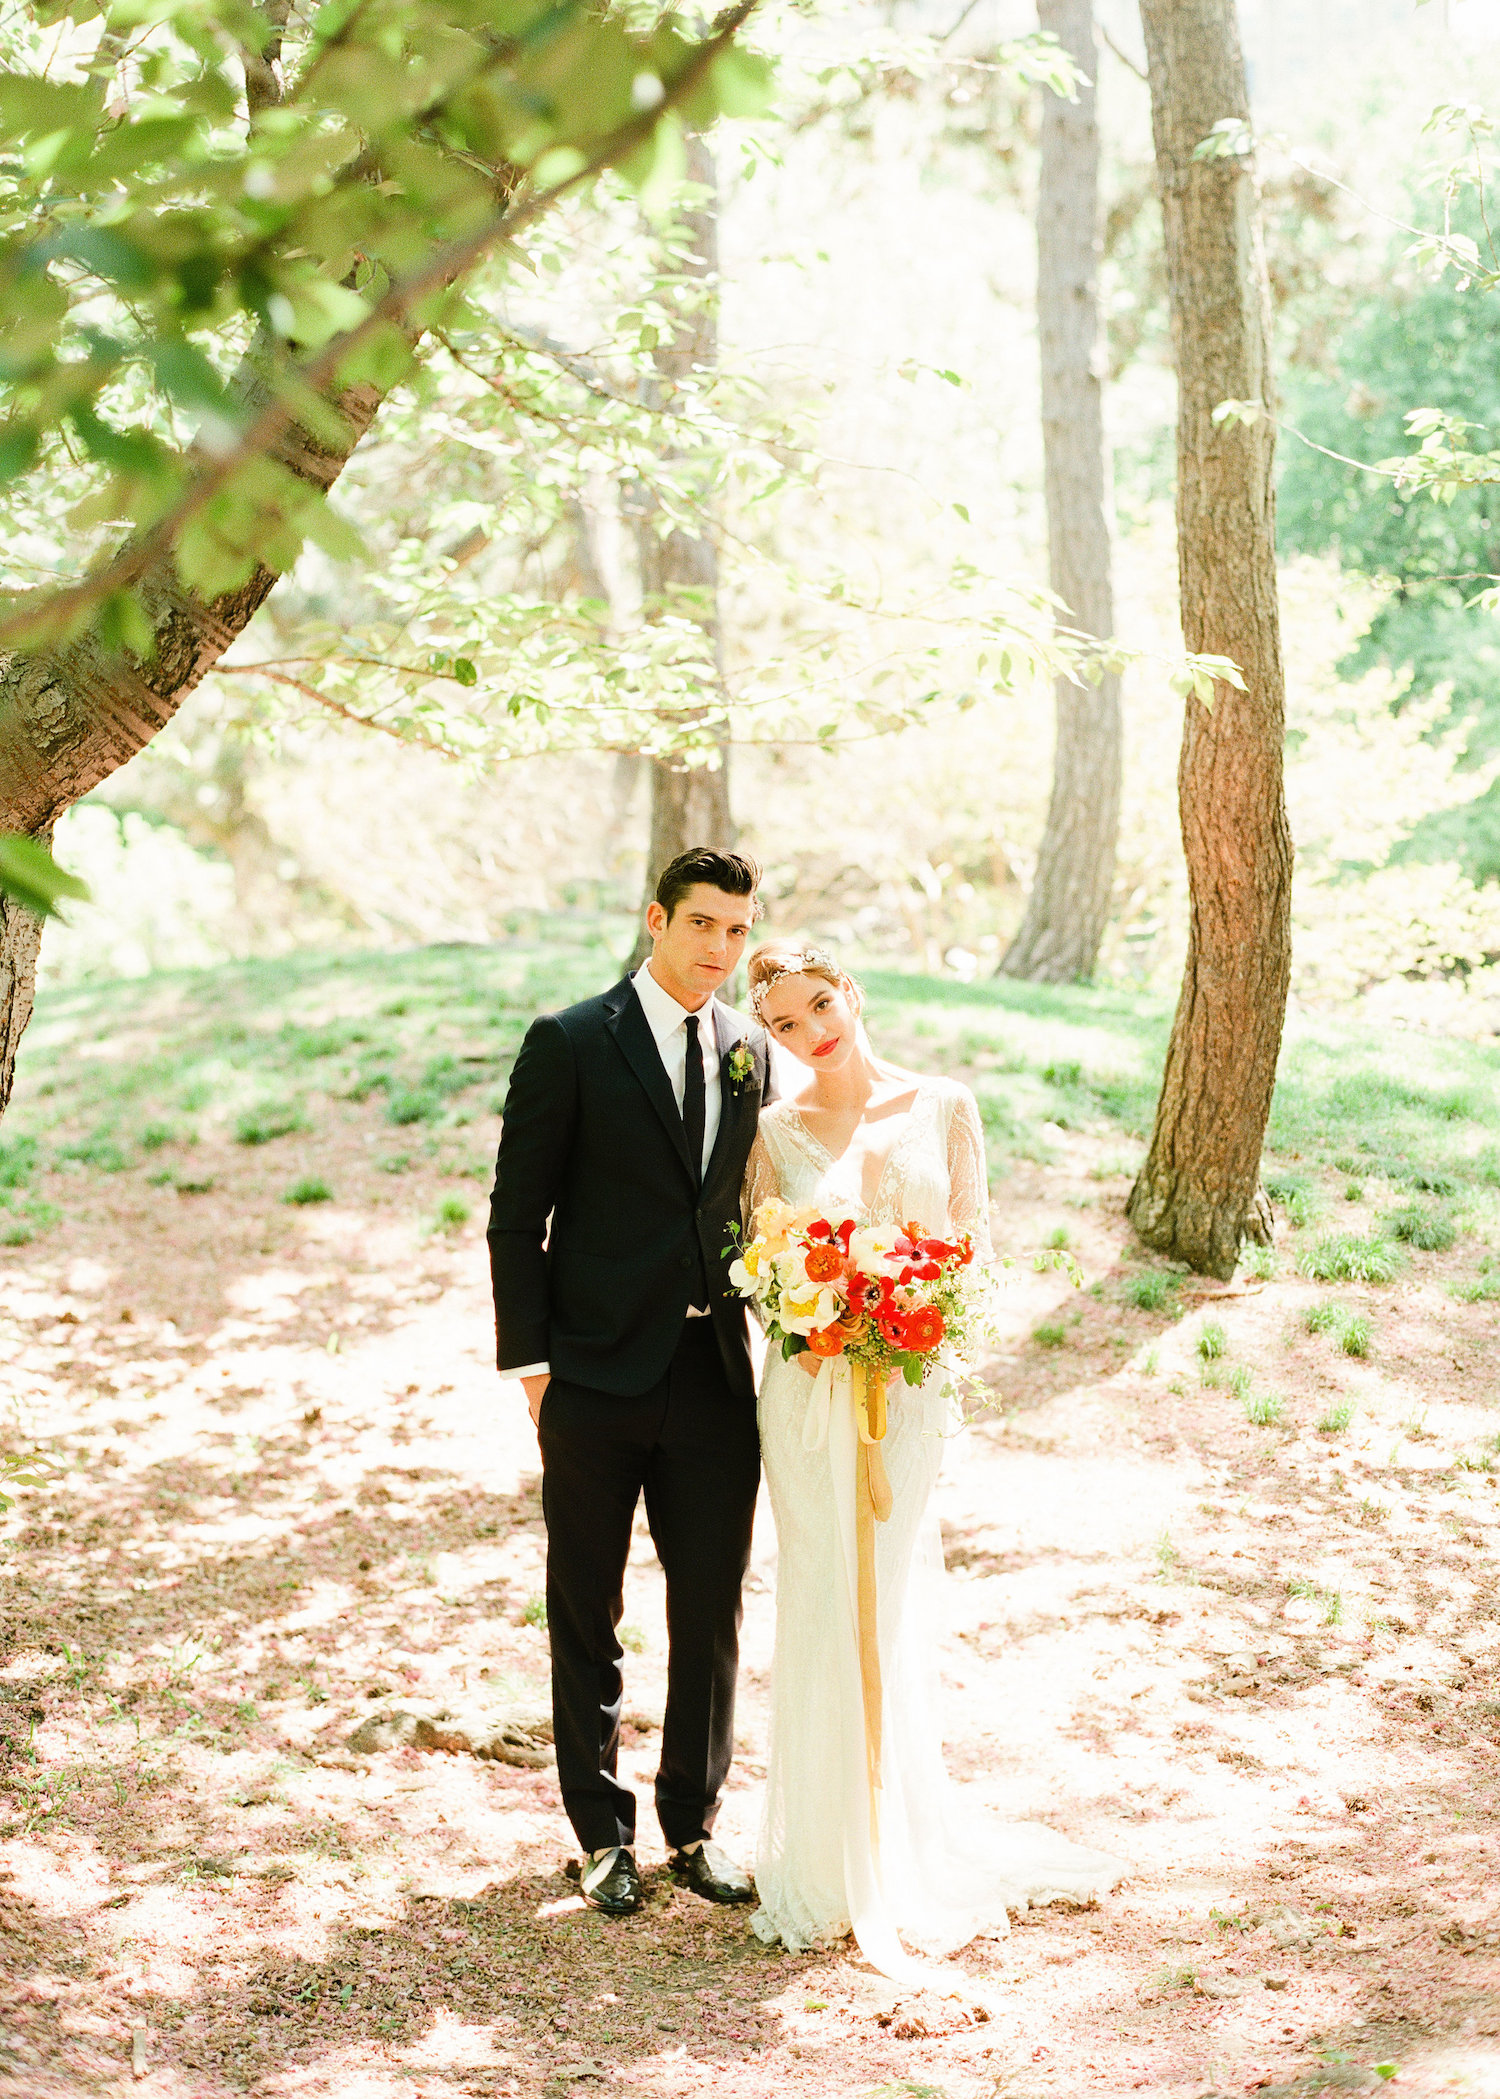 Morning Glow - Full Aperture Floral & Lindsay Madden Photography 24.jpeg